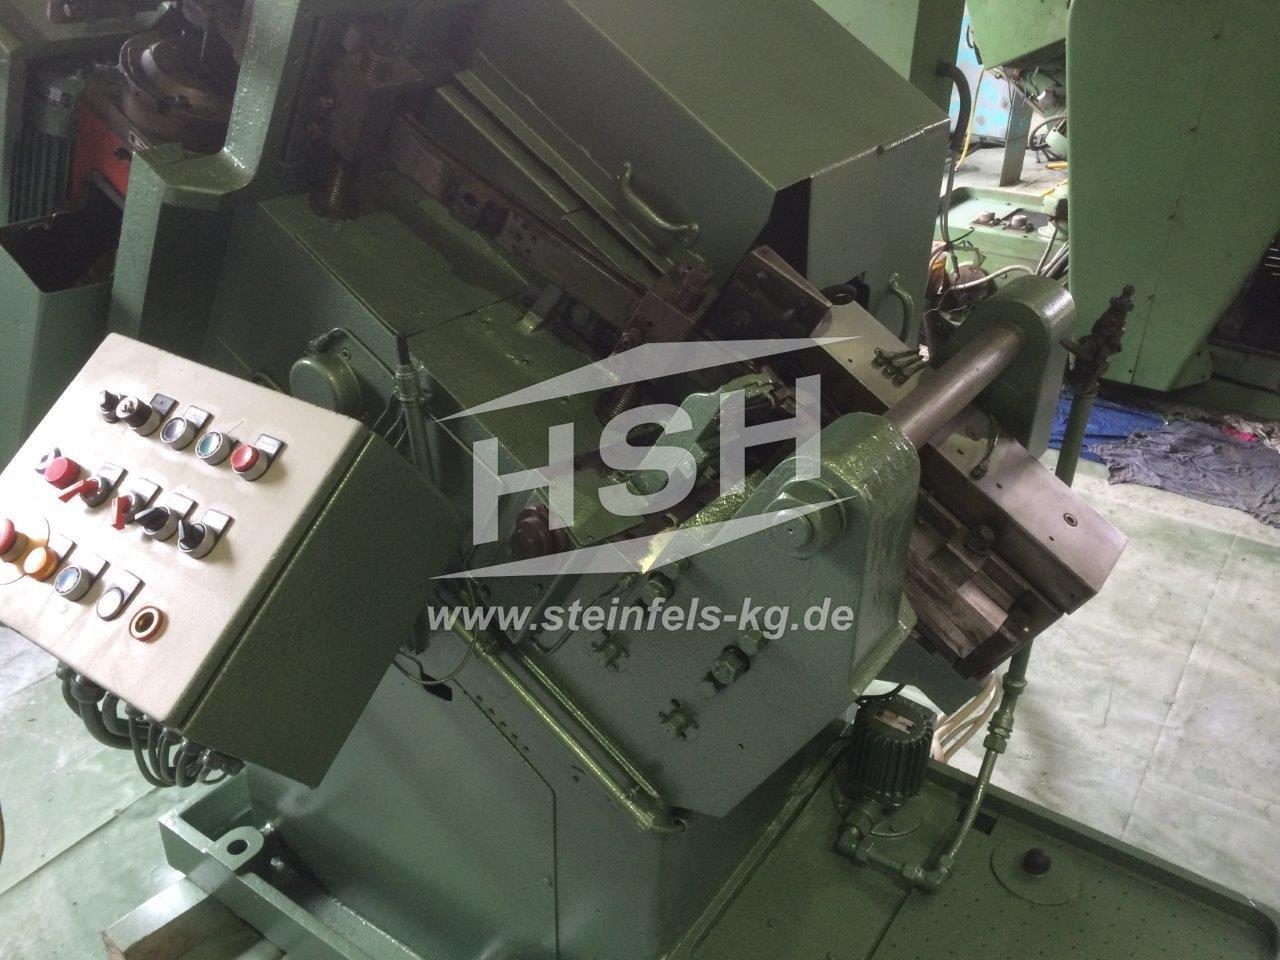 M14L/7148 – PELTZER-EHLERS – NKWK8 – 1971 – 8 mm